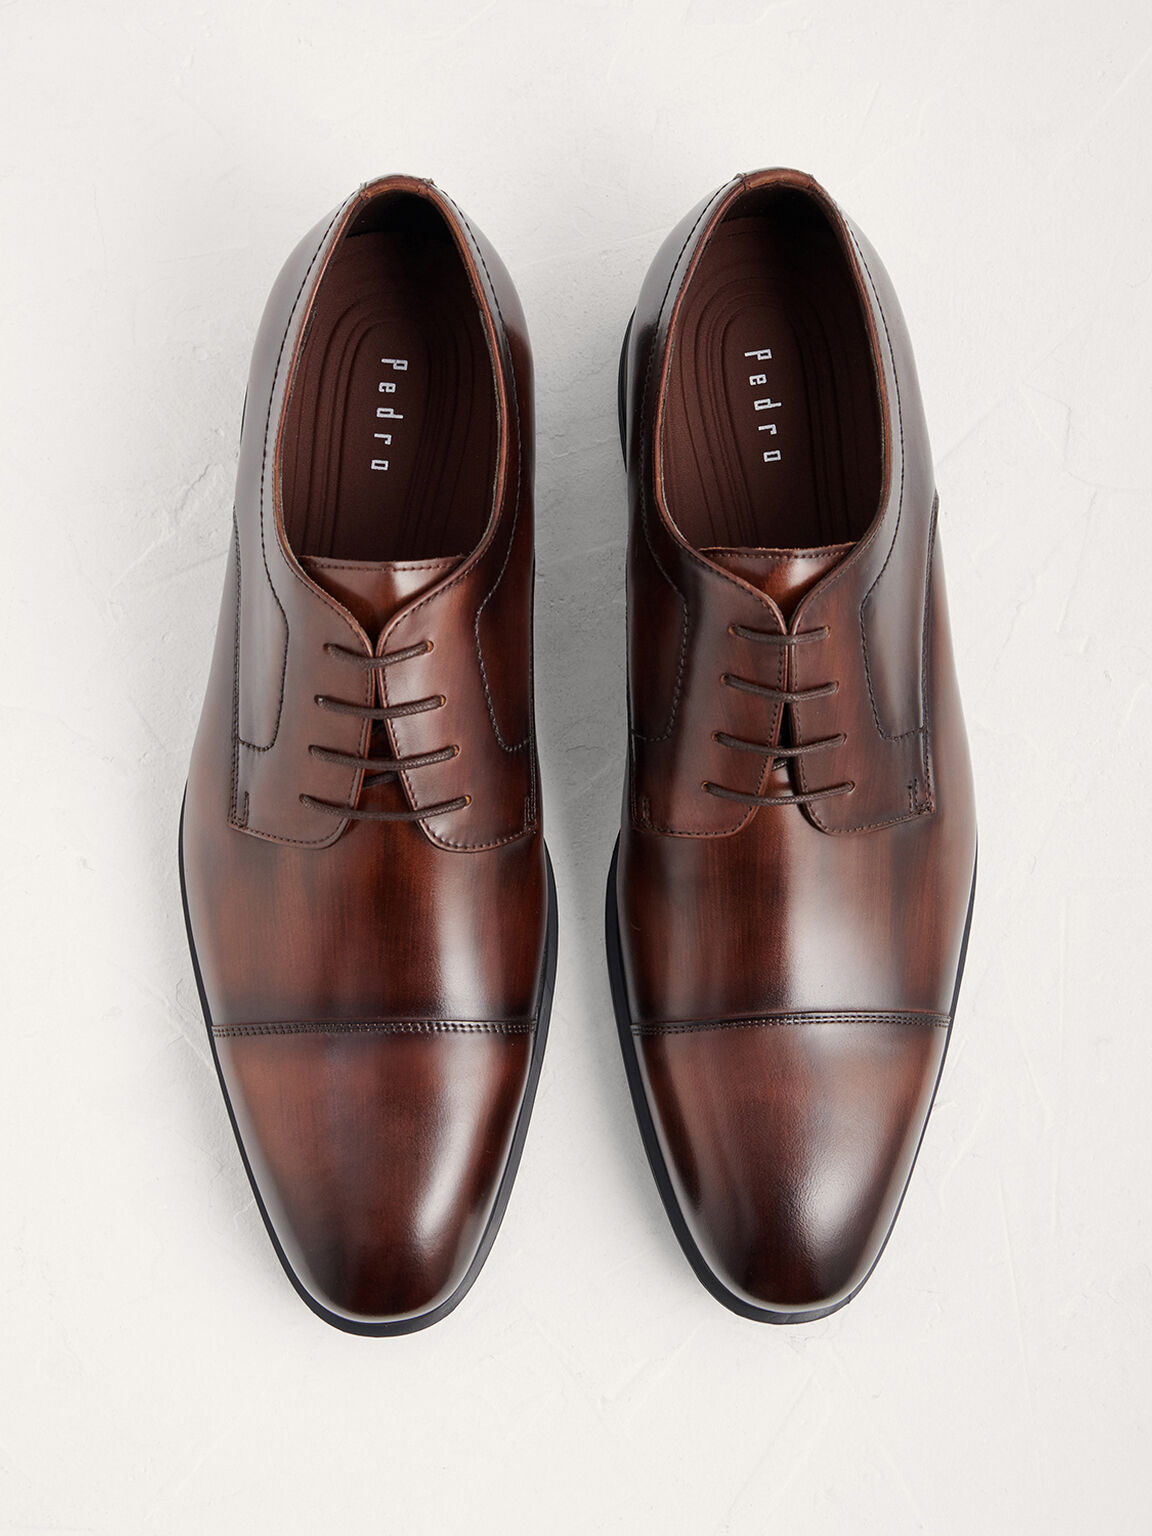 Leather Cap Toe Derby Shoes, Light Brown, hi-res